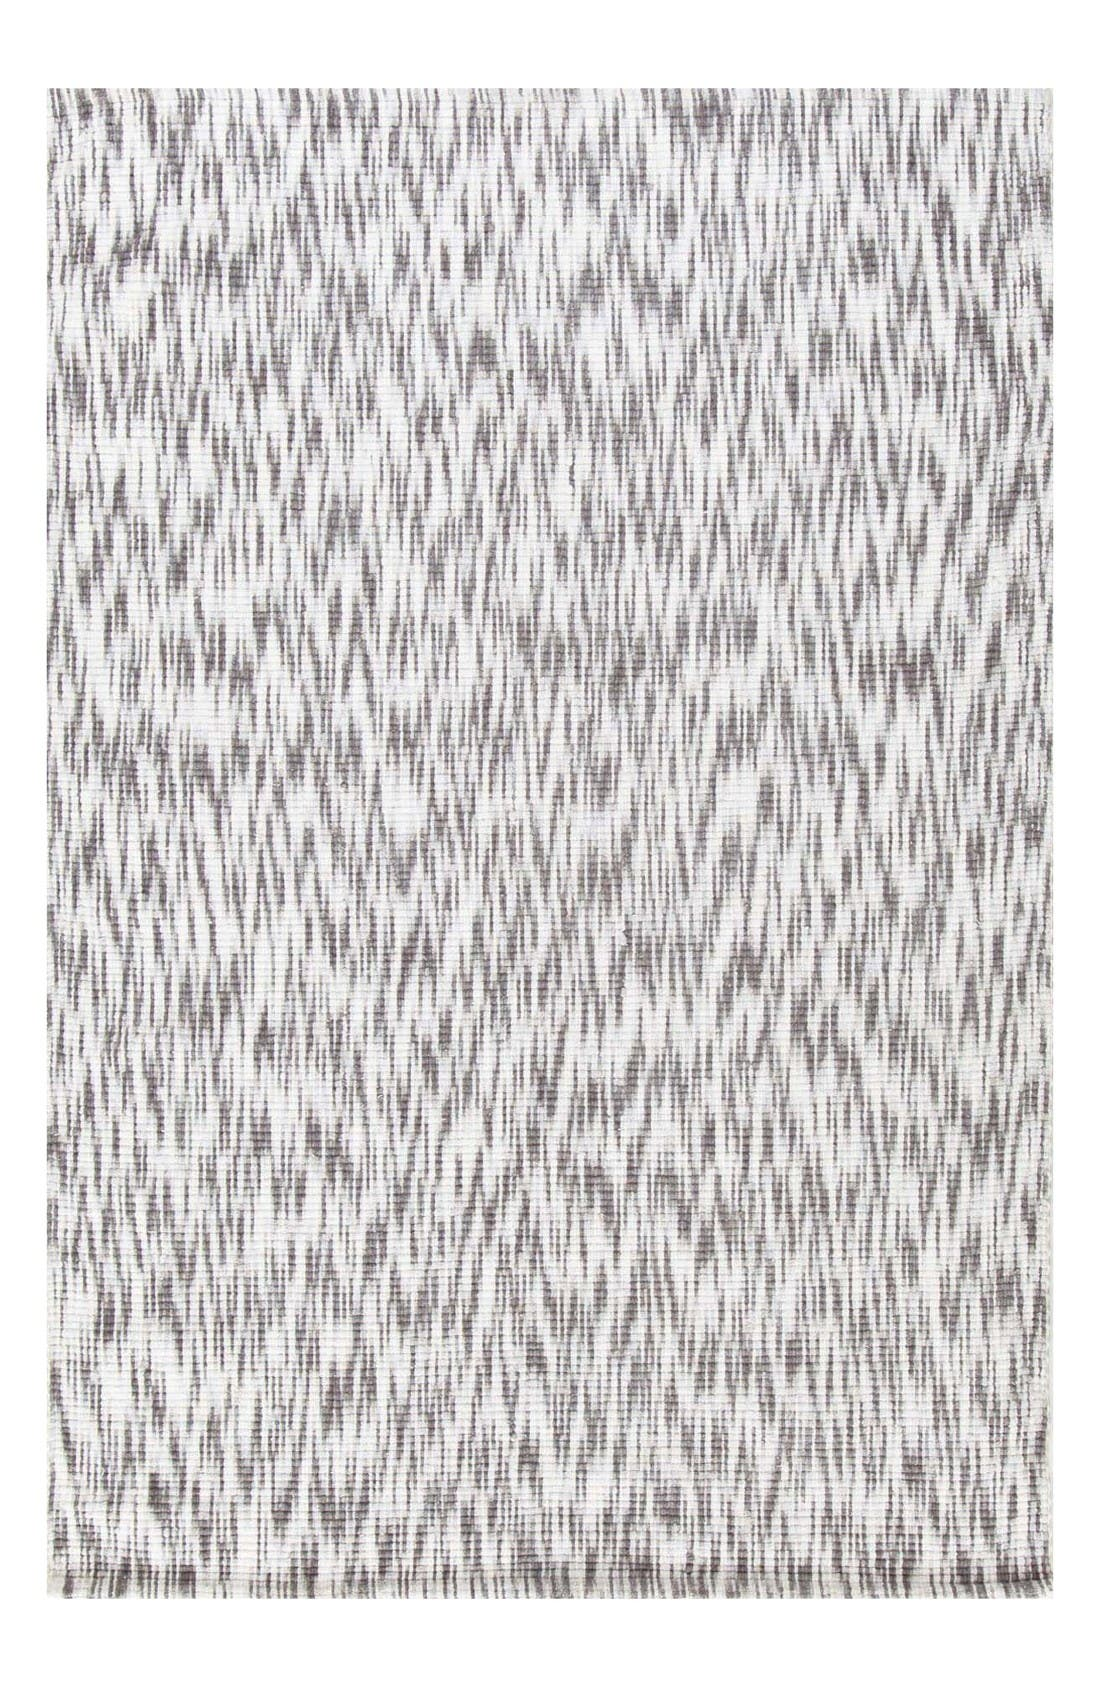 Ikat Rug,                         Main,                         color, Grey